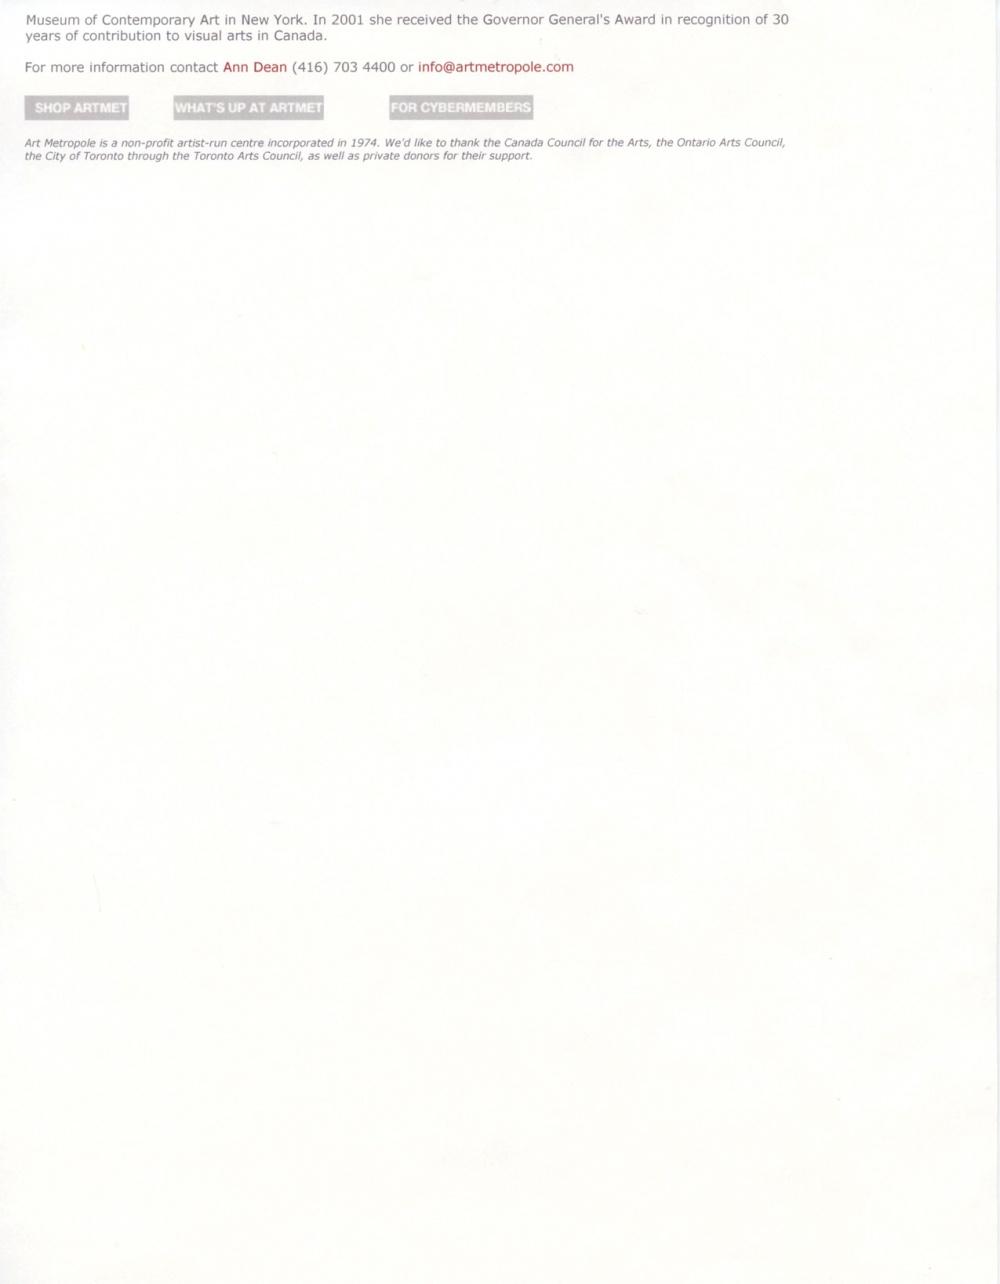 AMA0602.2, page 2